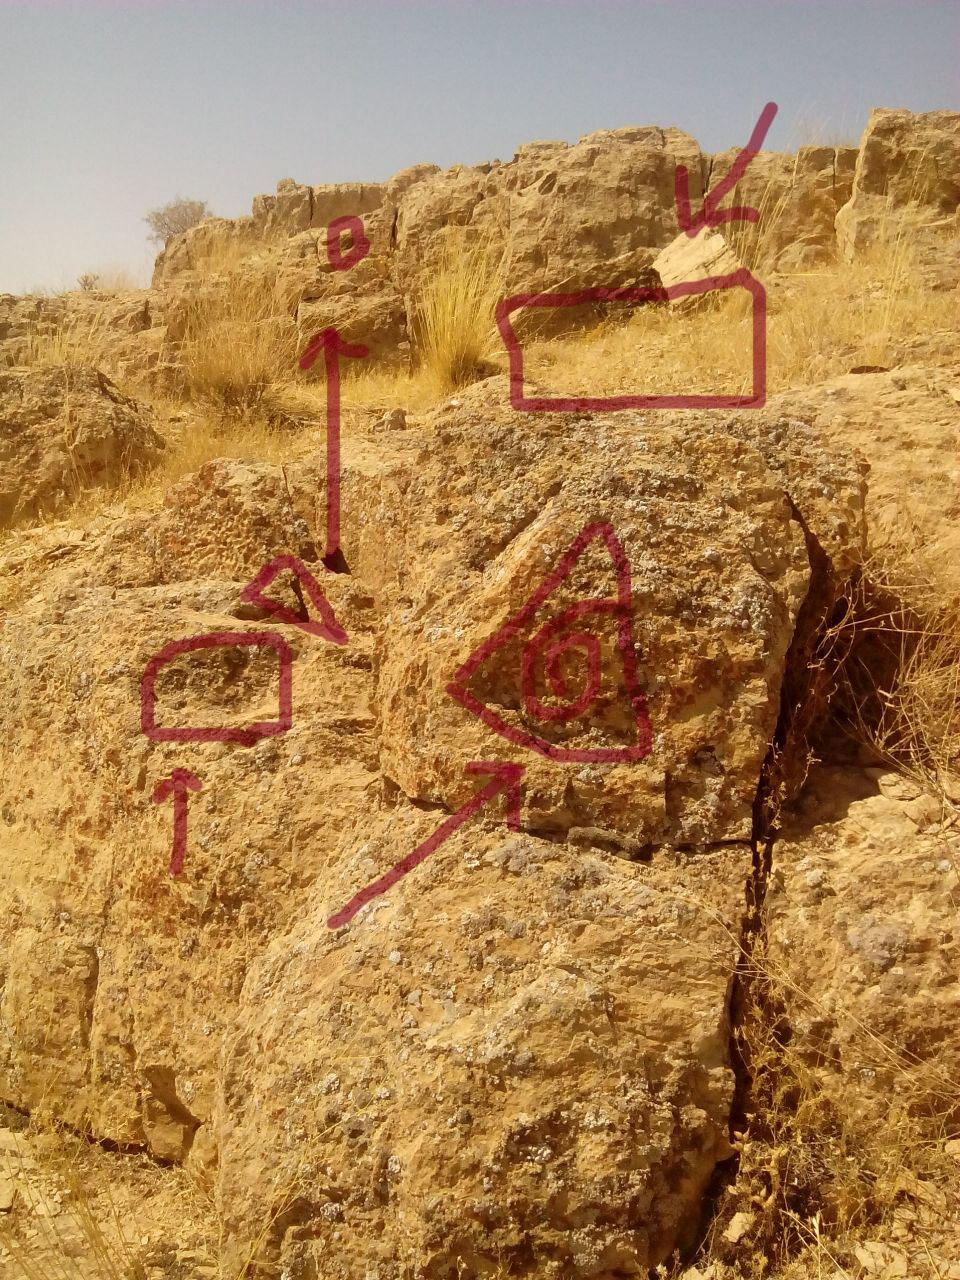 کارشناسی سنگ نگاره مثلث به همراه جوغن مثلث در گنج یابی